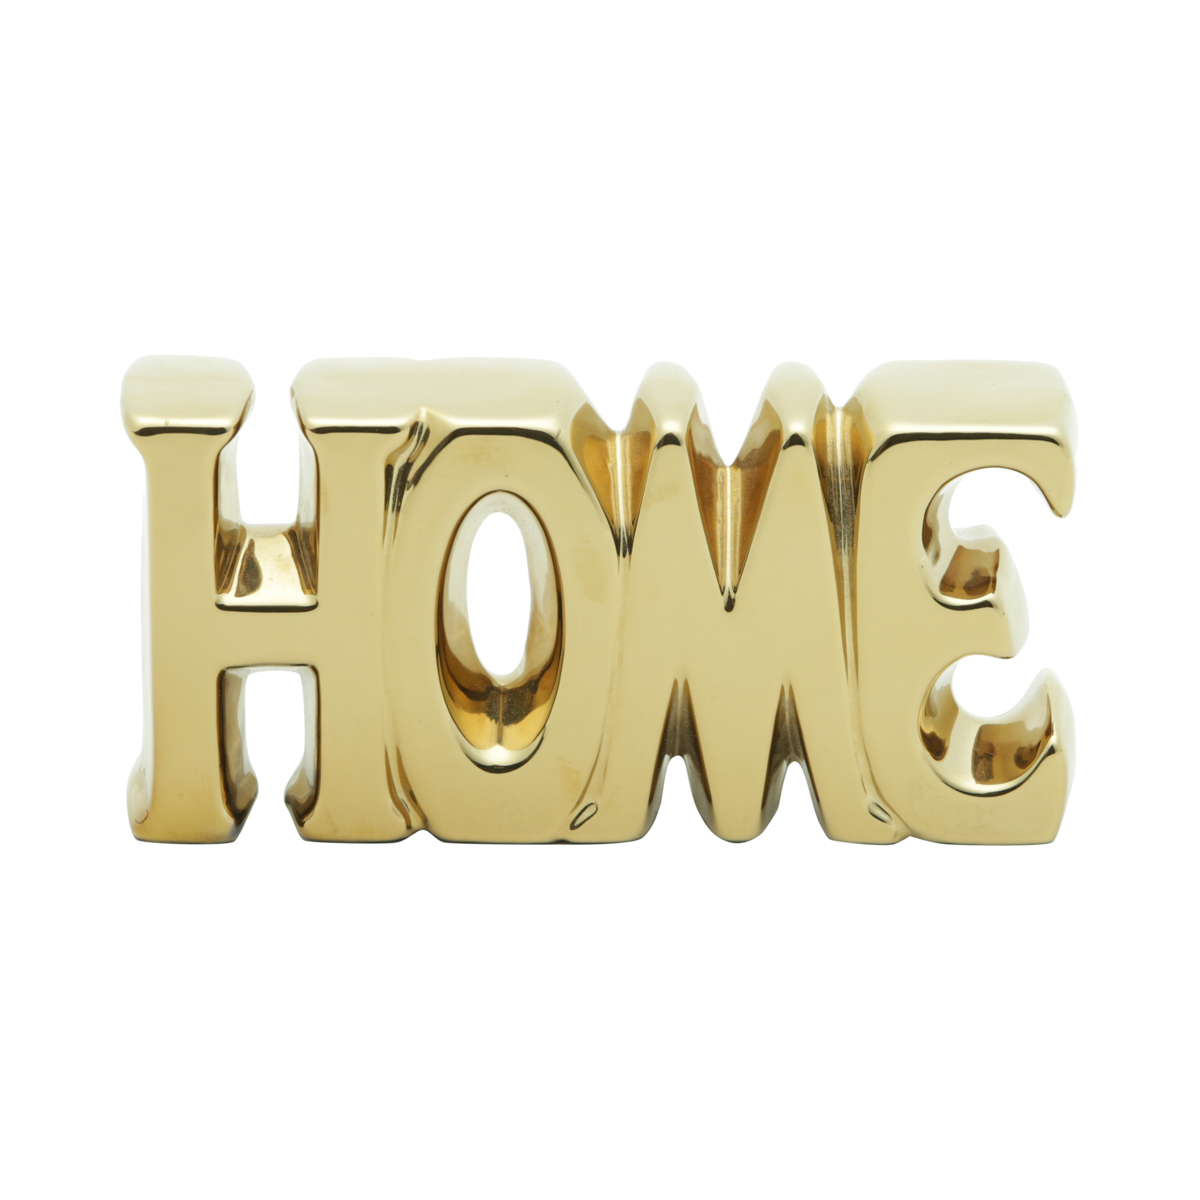 Decor Cerâmica Capslock Letter Home Dourada Peq 18,5X3,5X9Cm